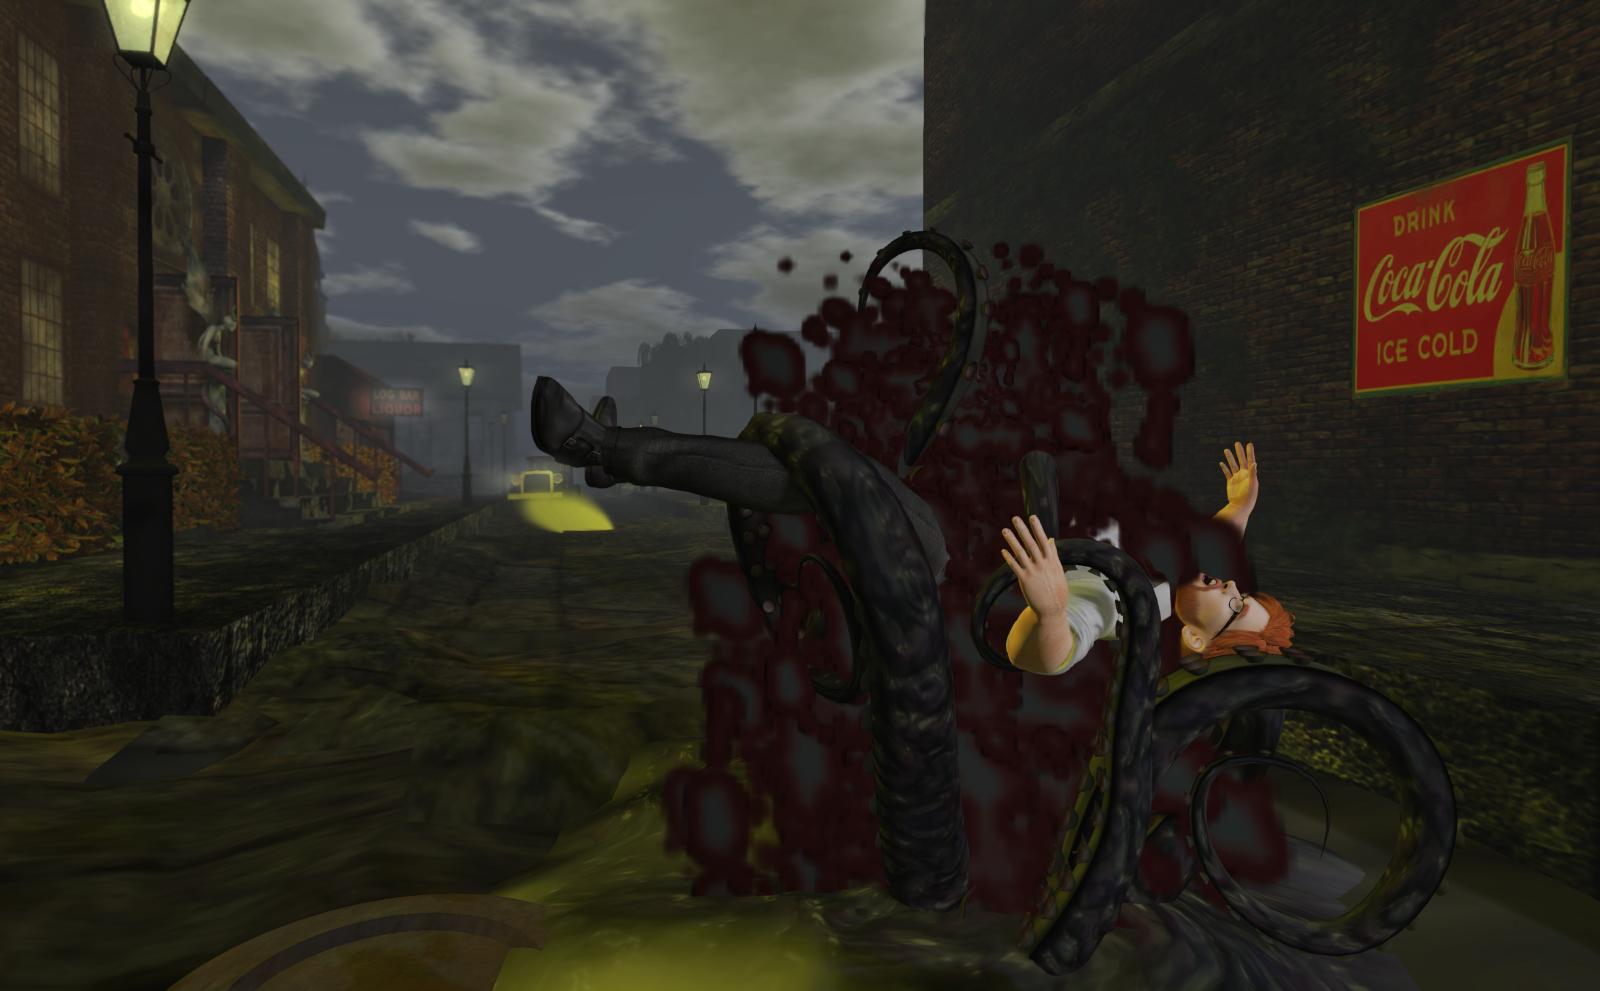 Ricco and the octopus hug